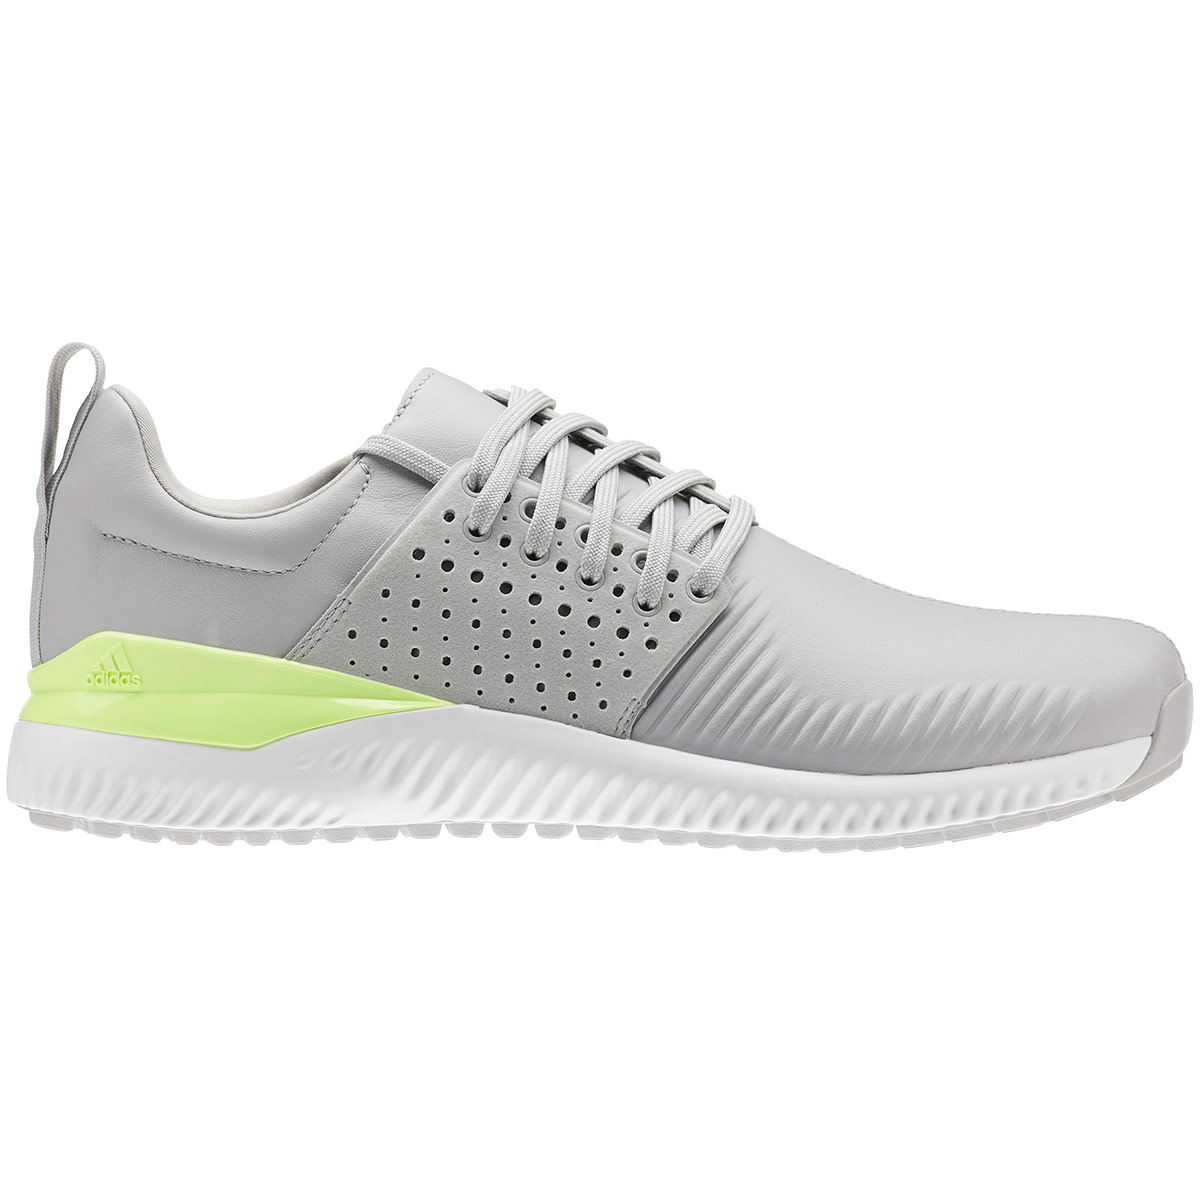 online store b380a 7445e ... Adidas Adicross Bounce Lthr S9 ...